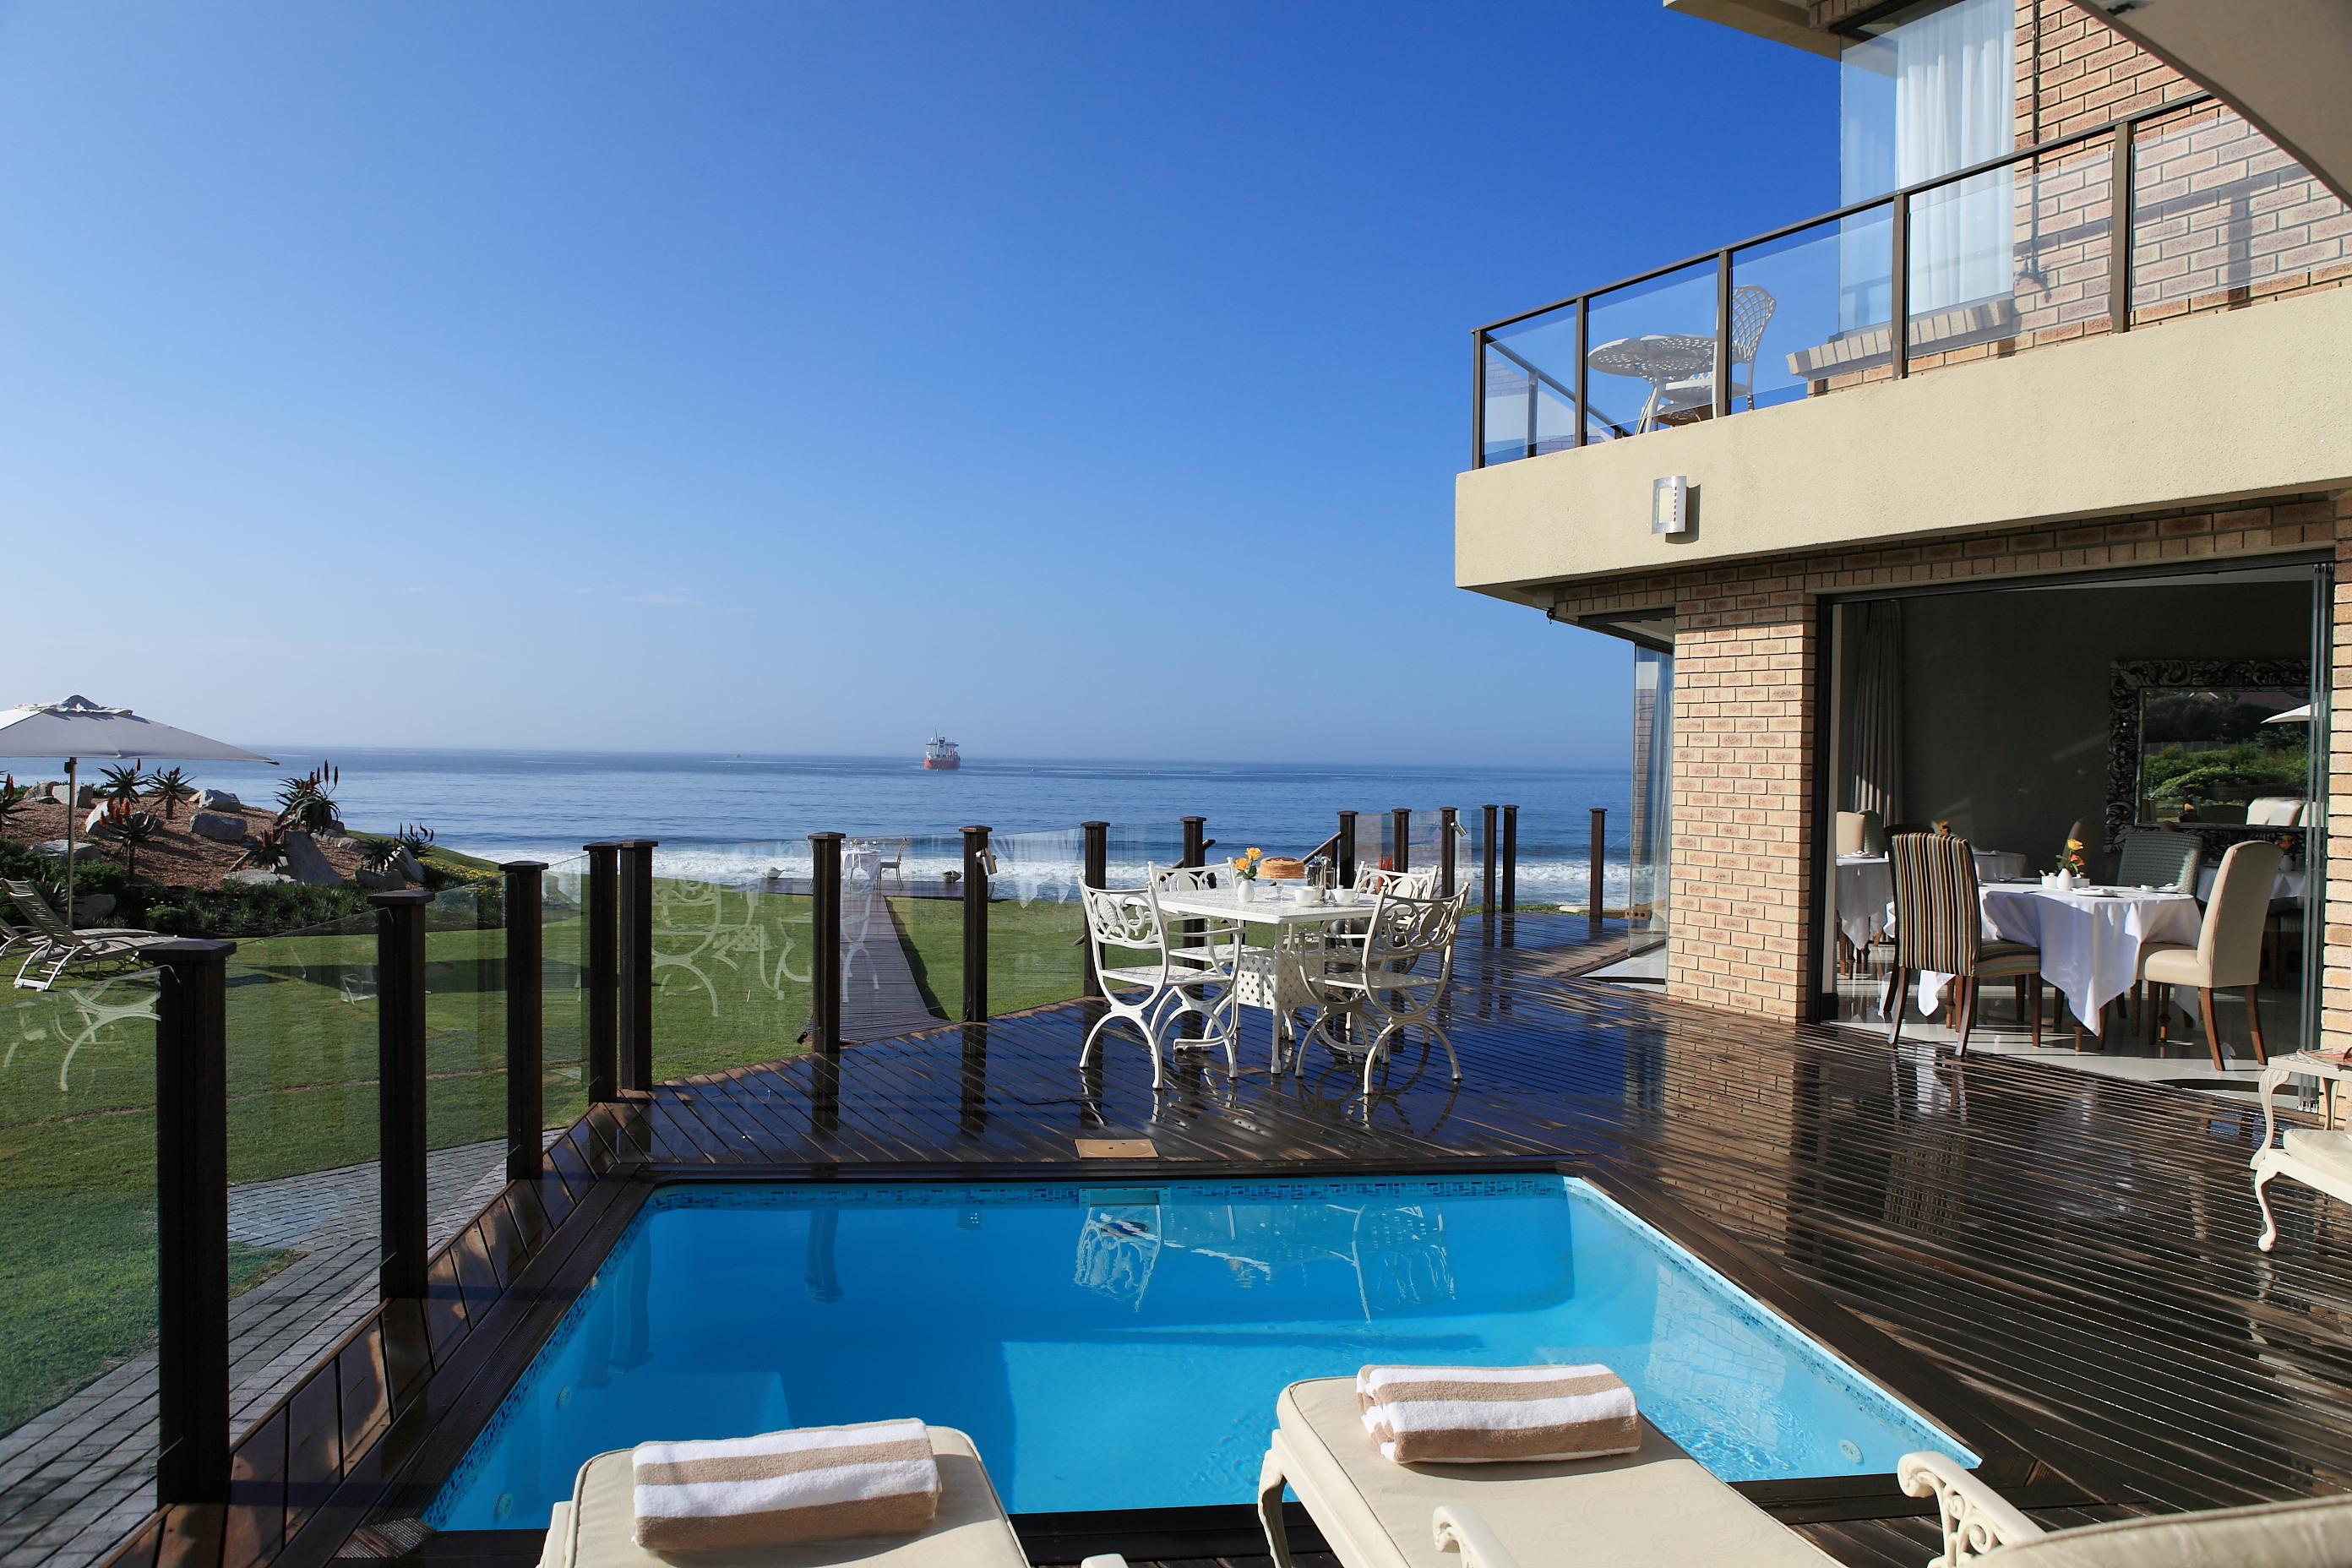 african oceans mossel bay deck view